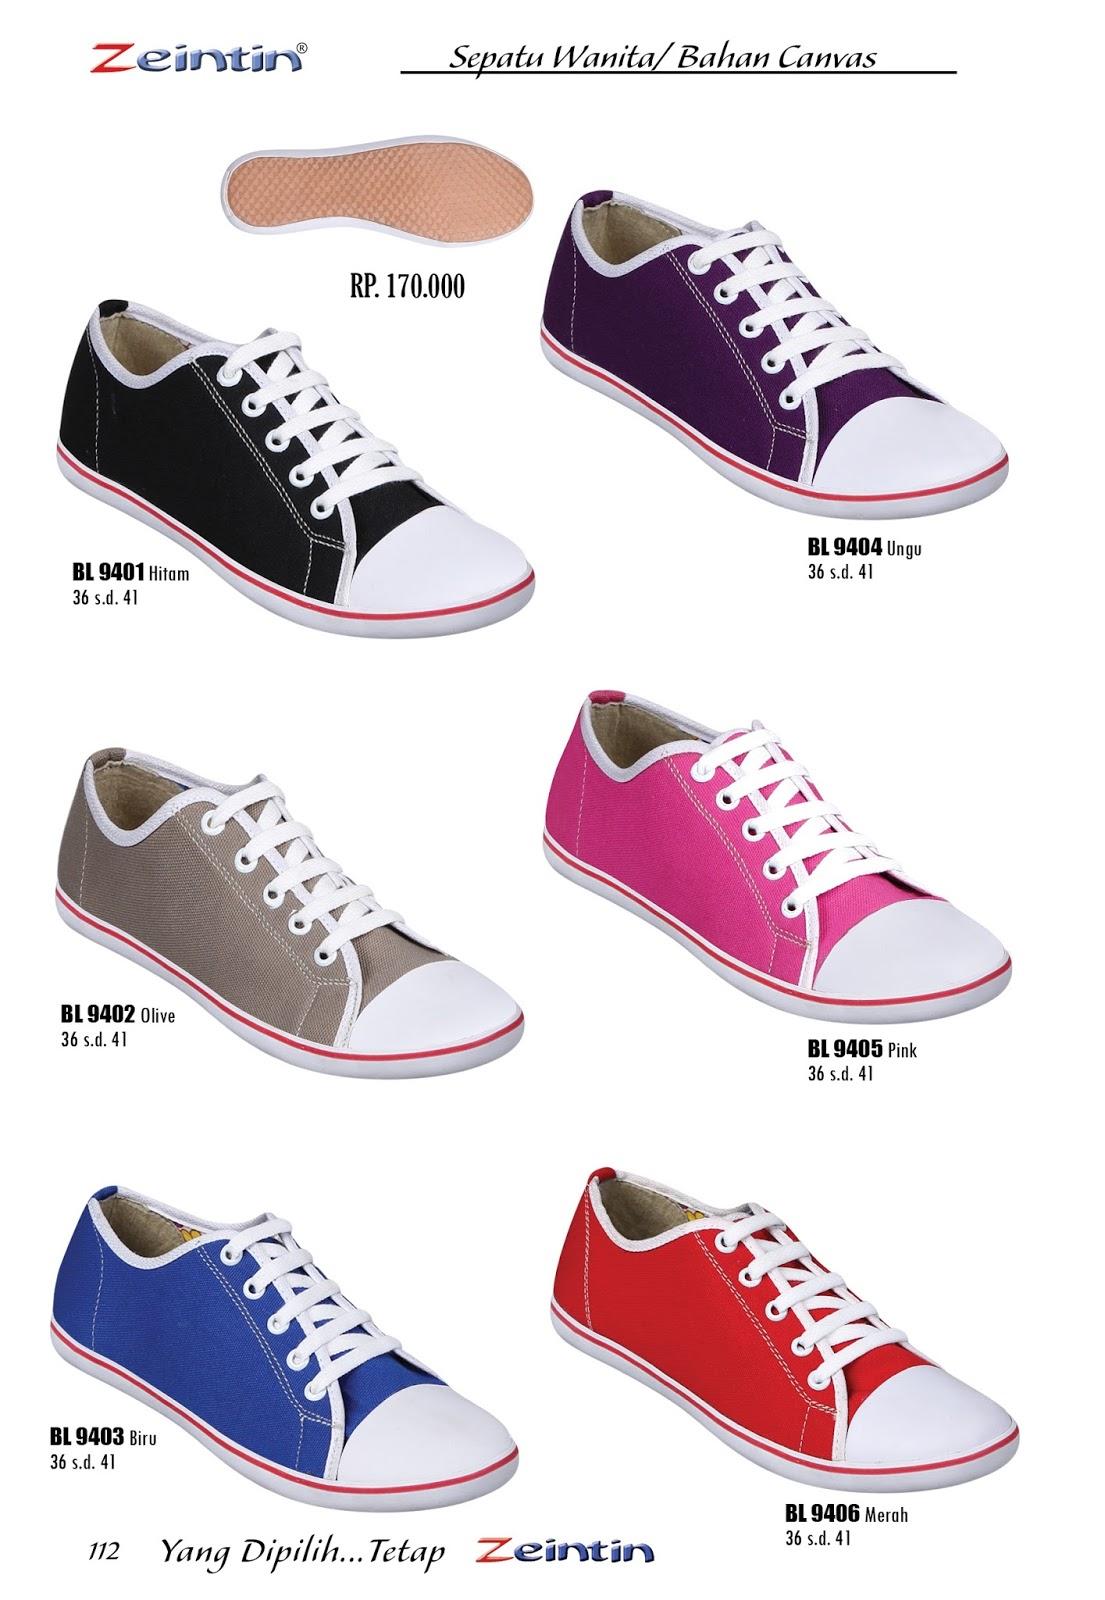 Zeintin Karang Tengah Sepatu Wanita Anak Cewek Warna Ungu